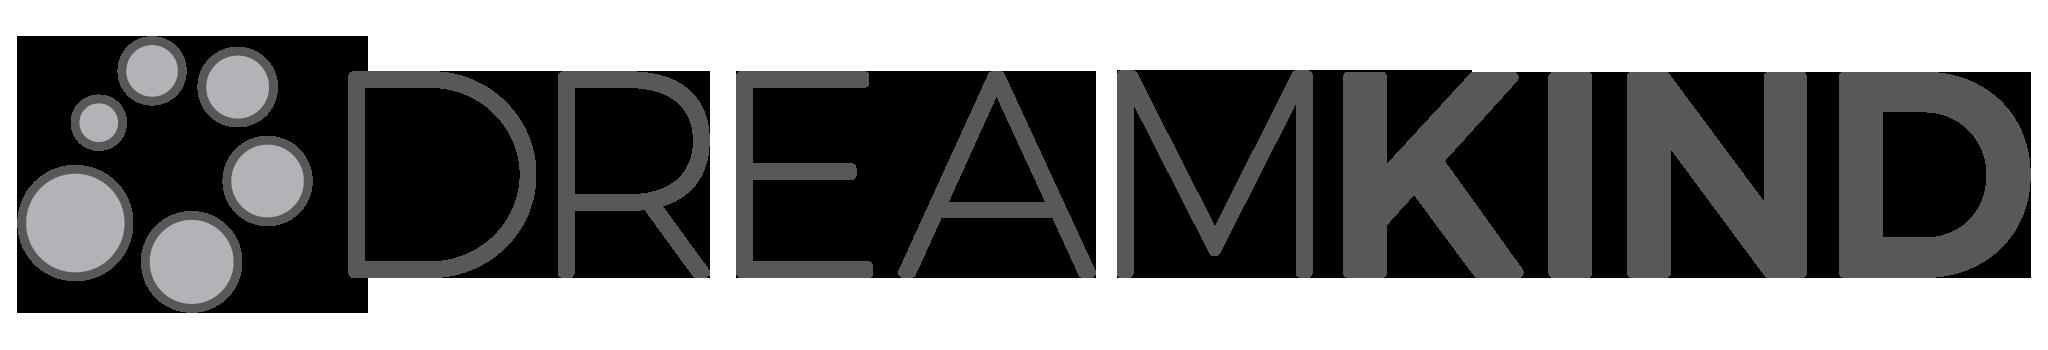 Dreamkind Logo